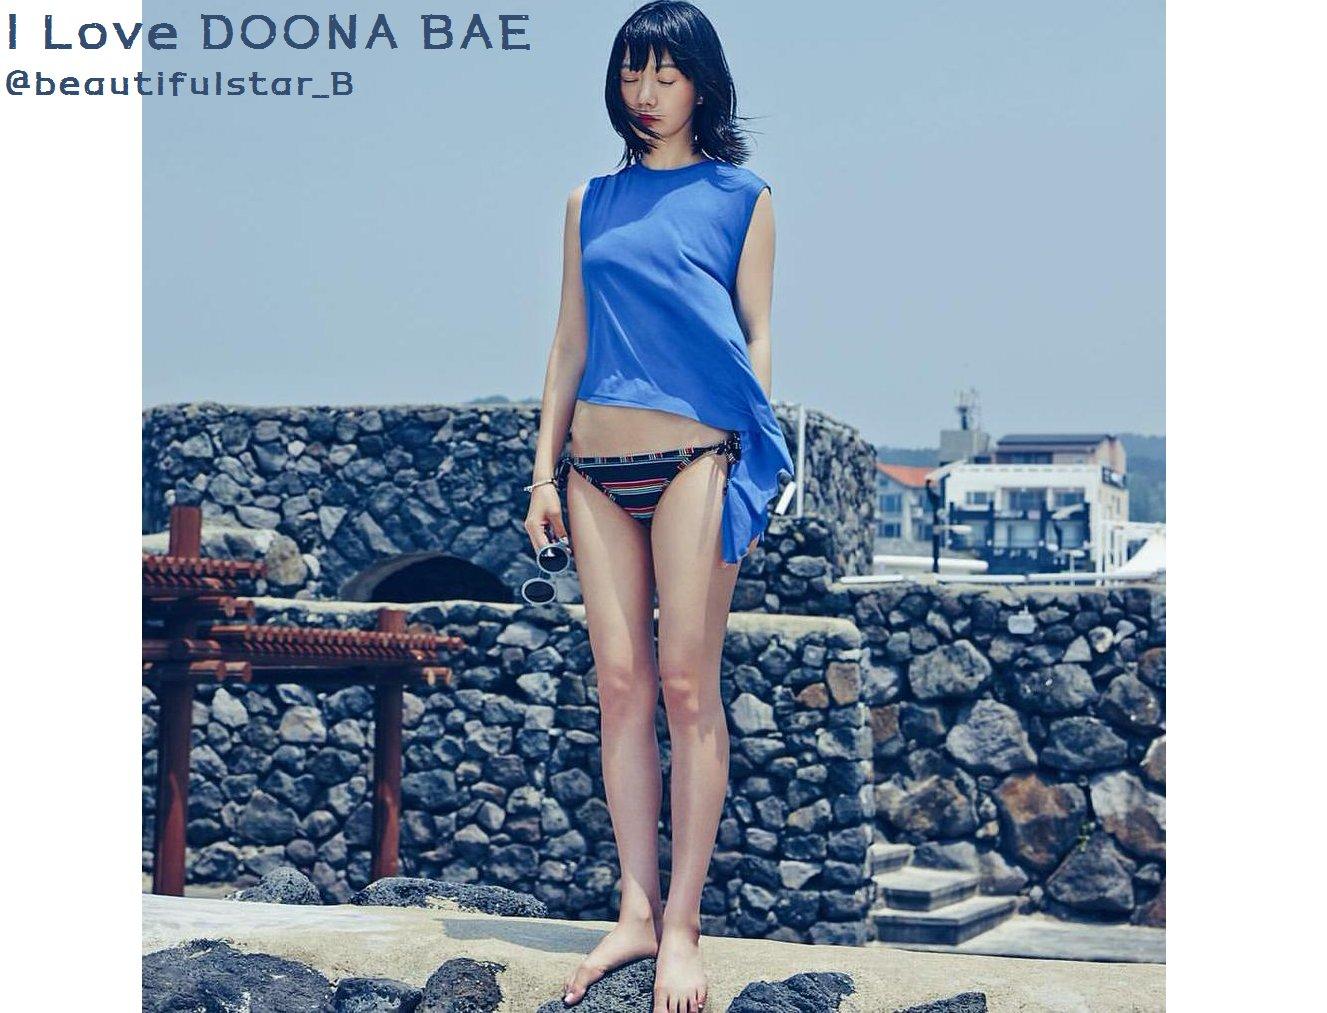 Bikini Doona Bae nude photos 2019